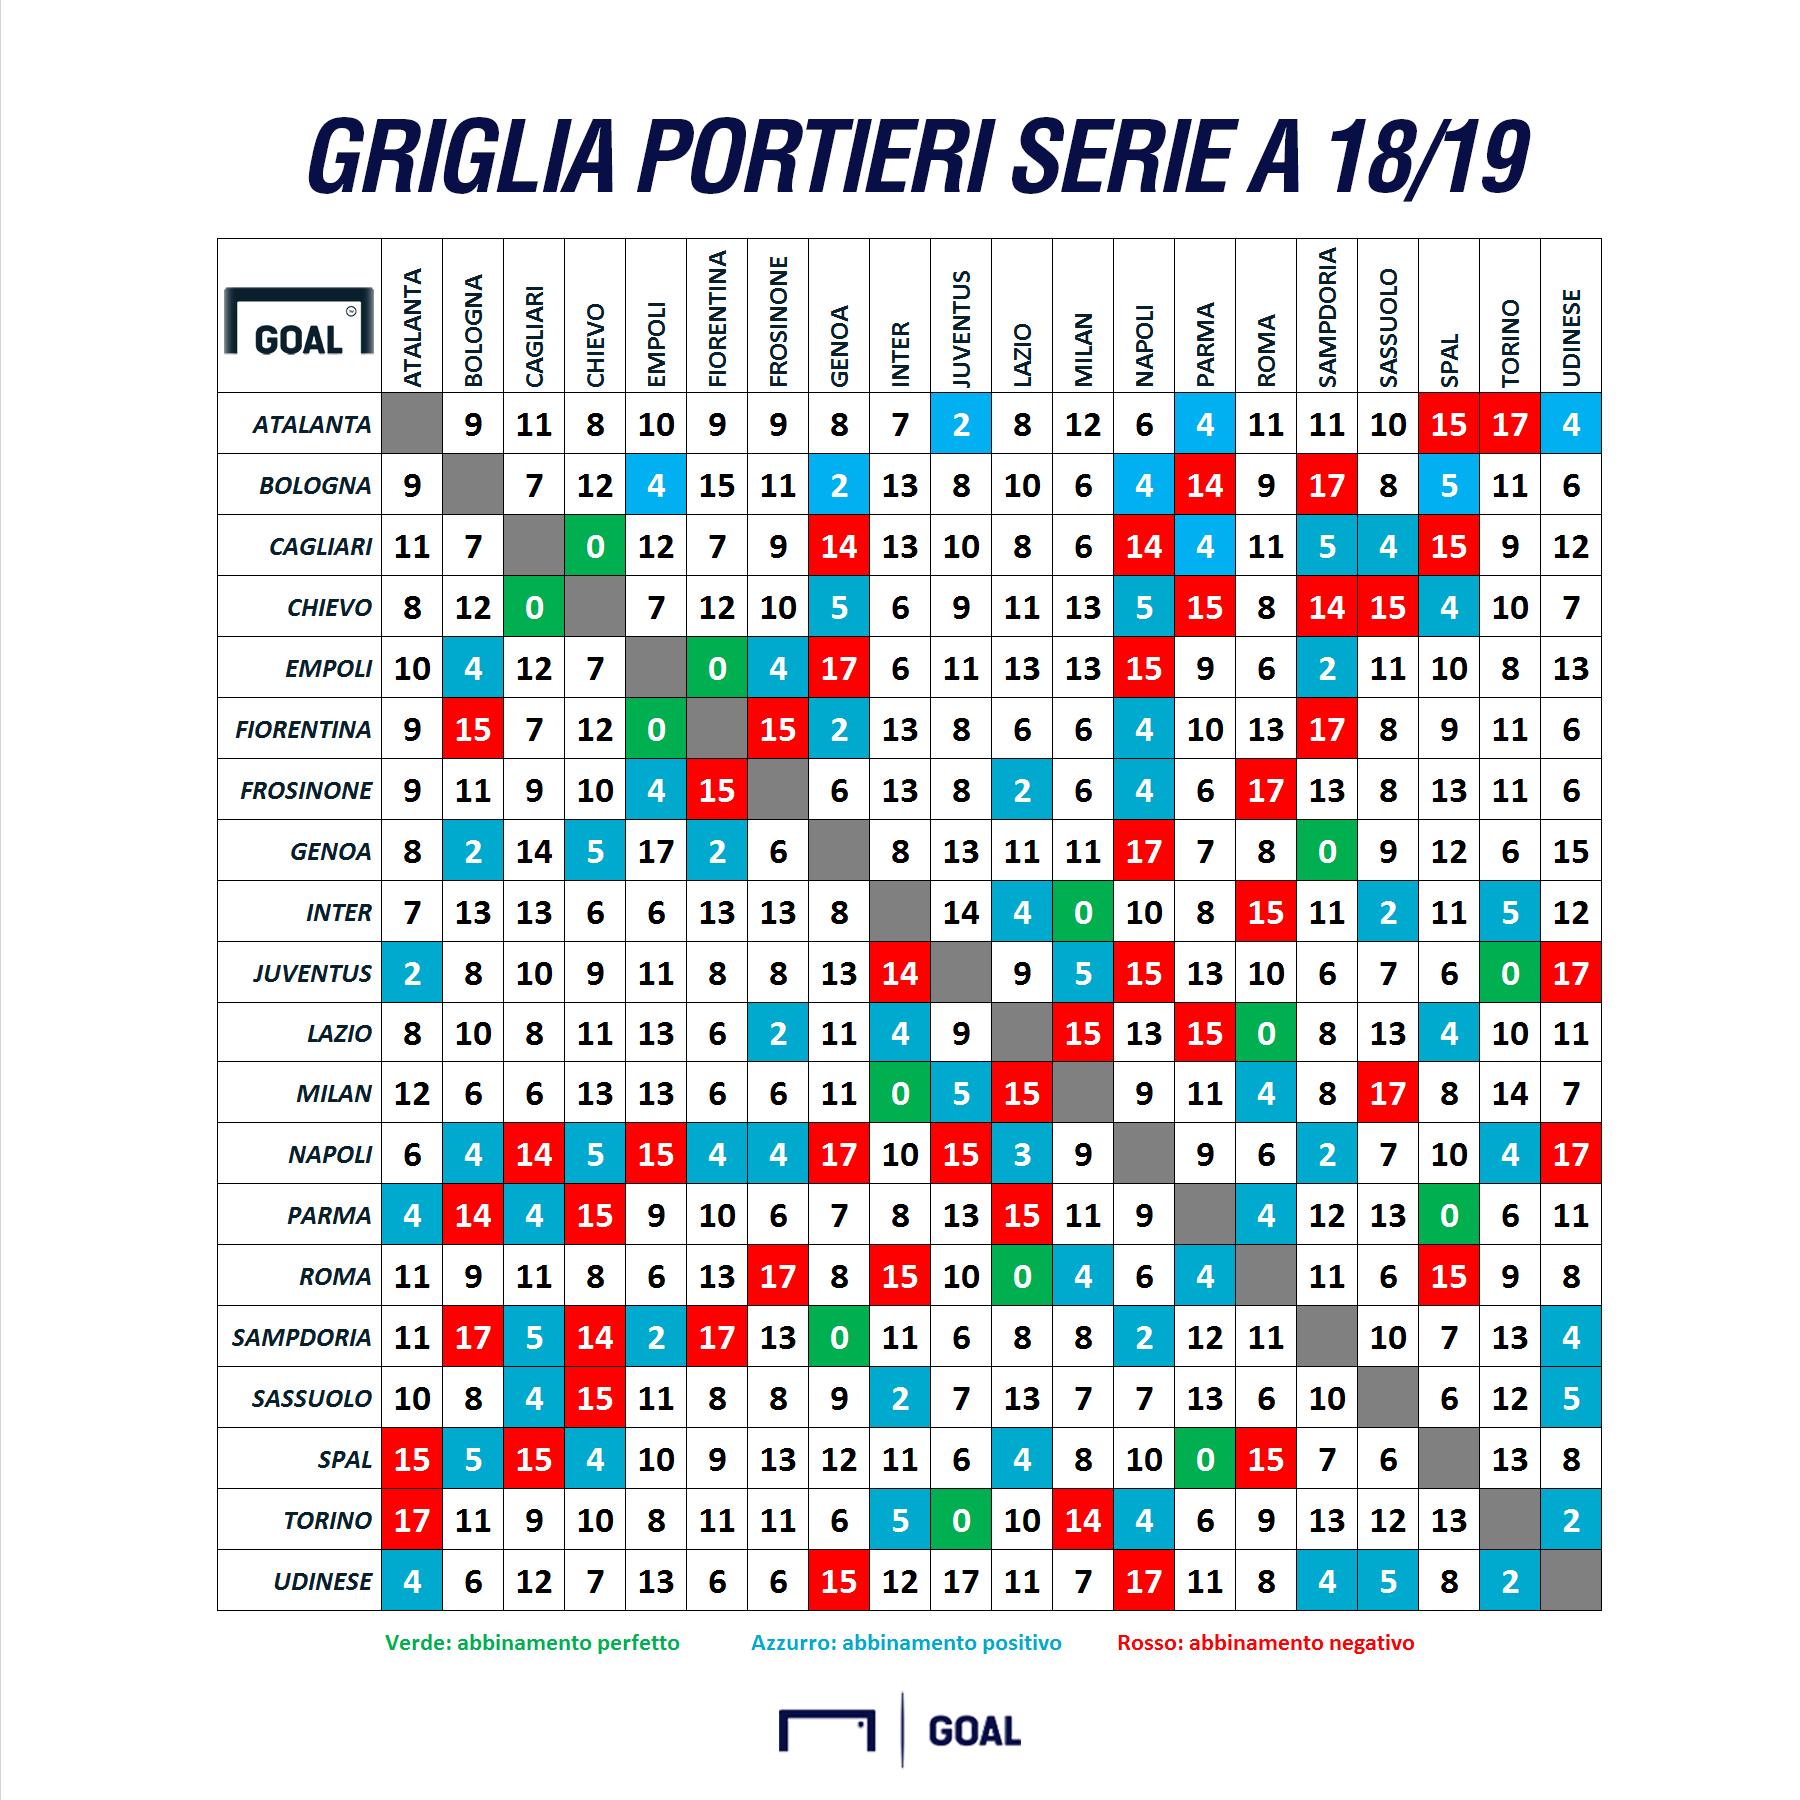 Fantacalcio Griglia Portieri Serie A 18/19